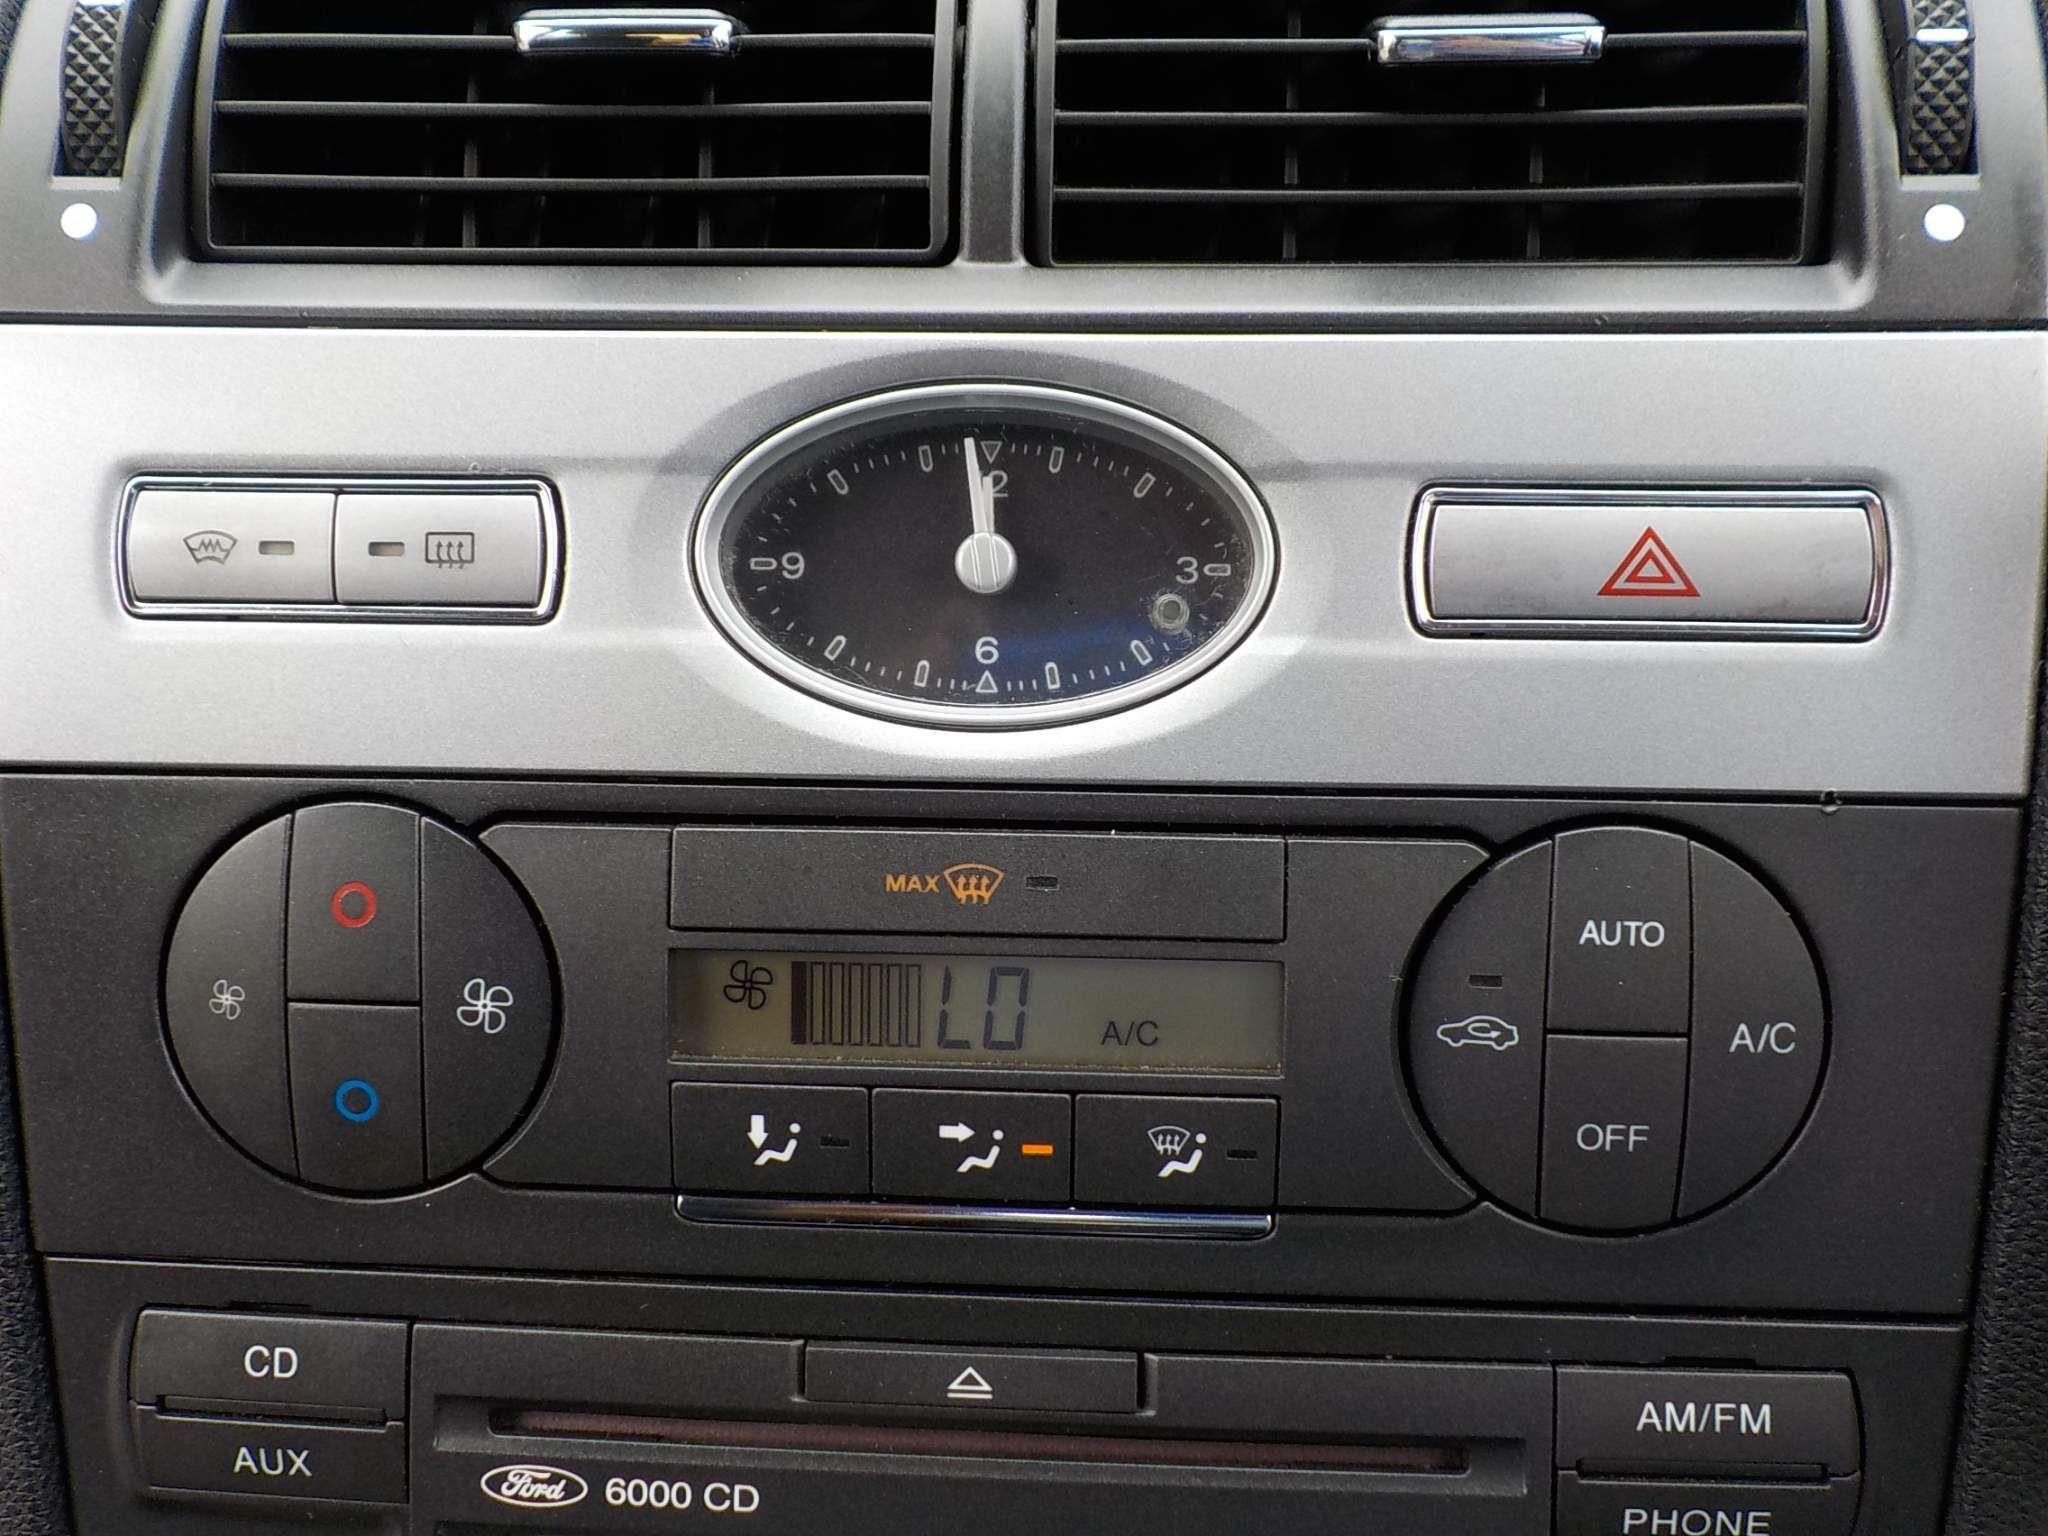 Ford Mondeo 2.0 TDCi SIV Zetec 5dr